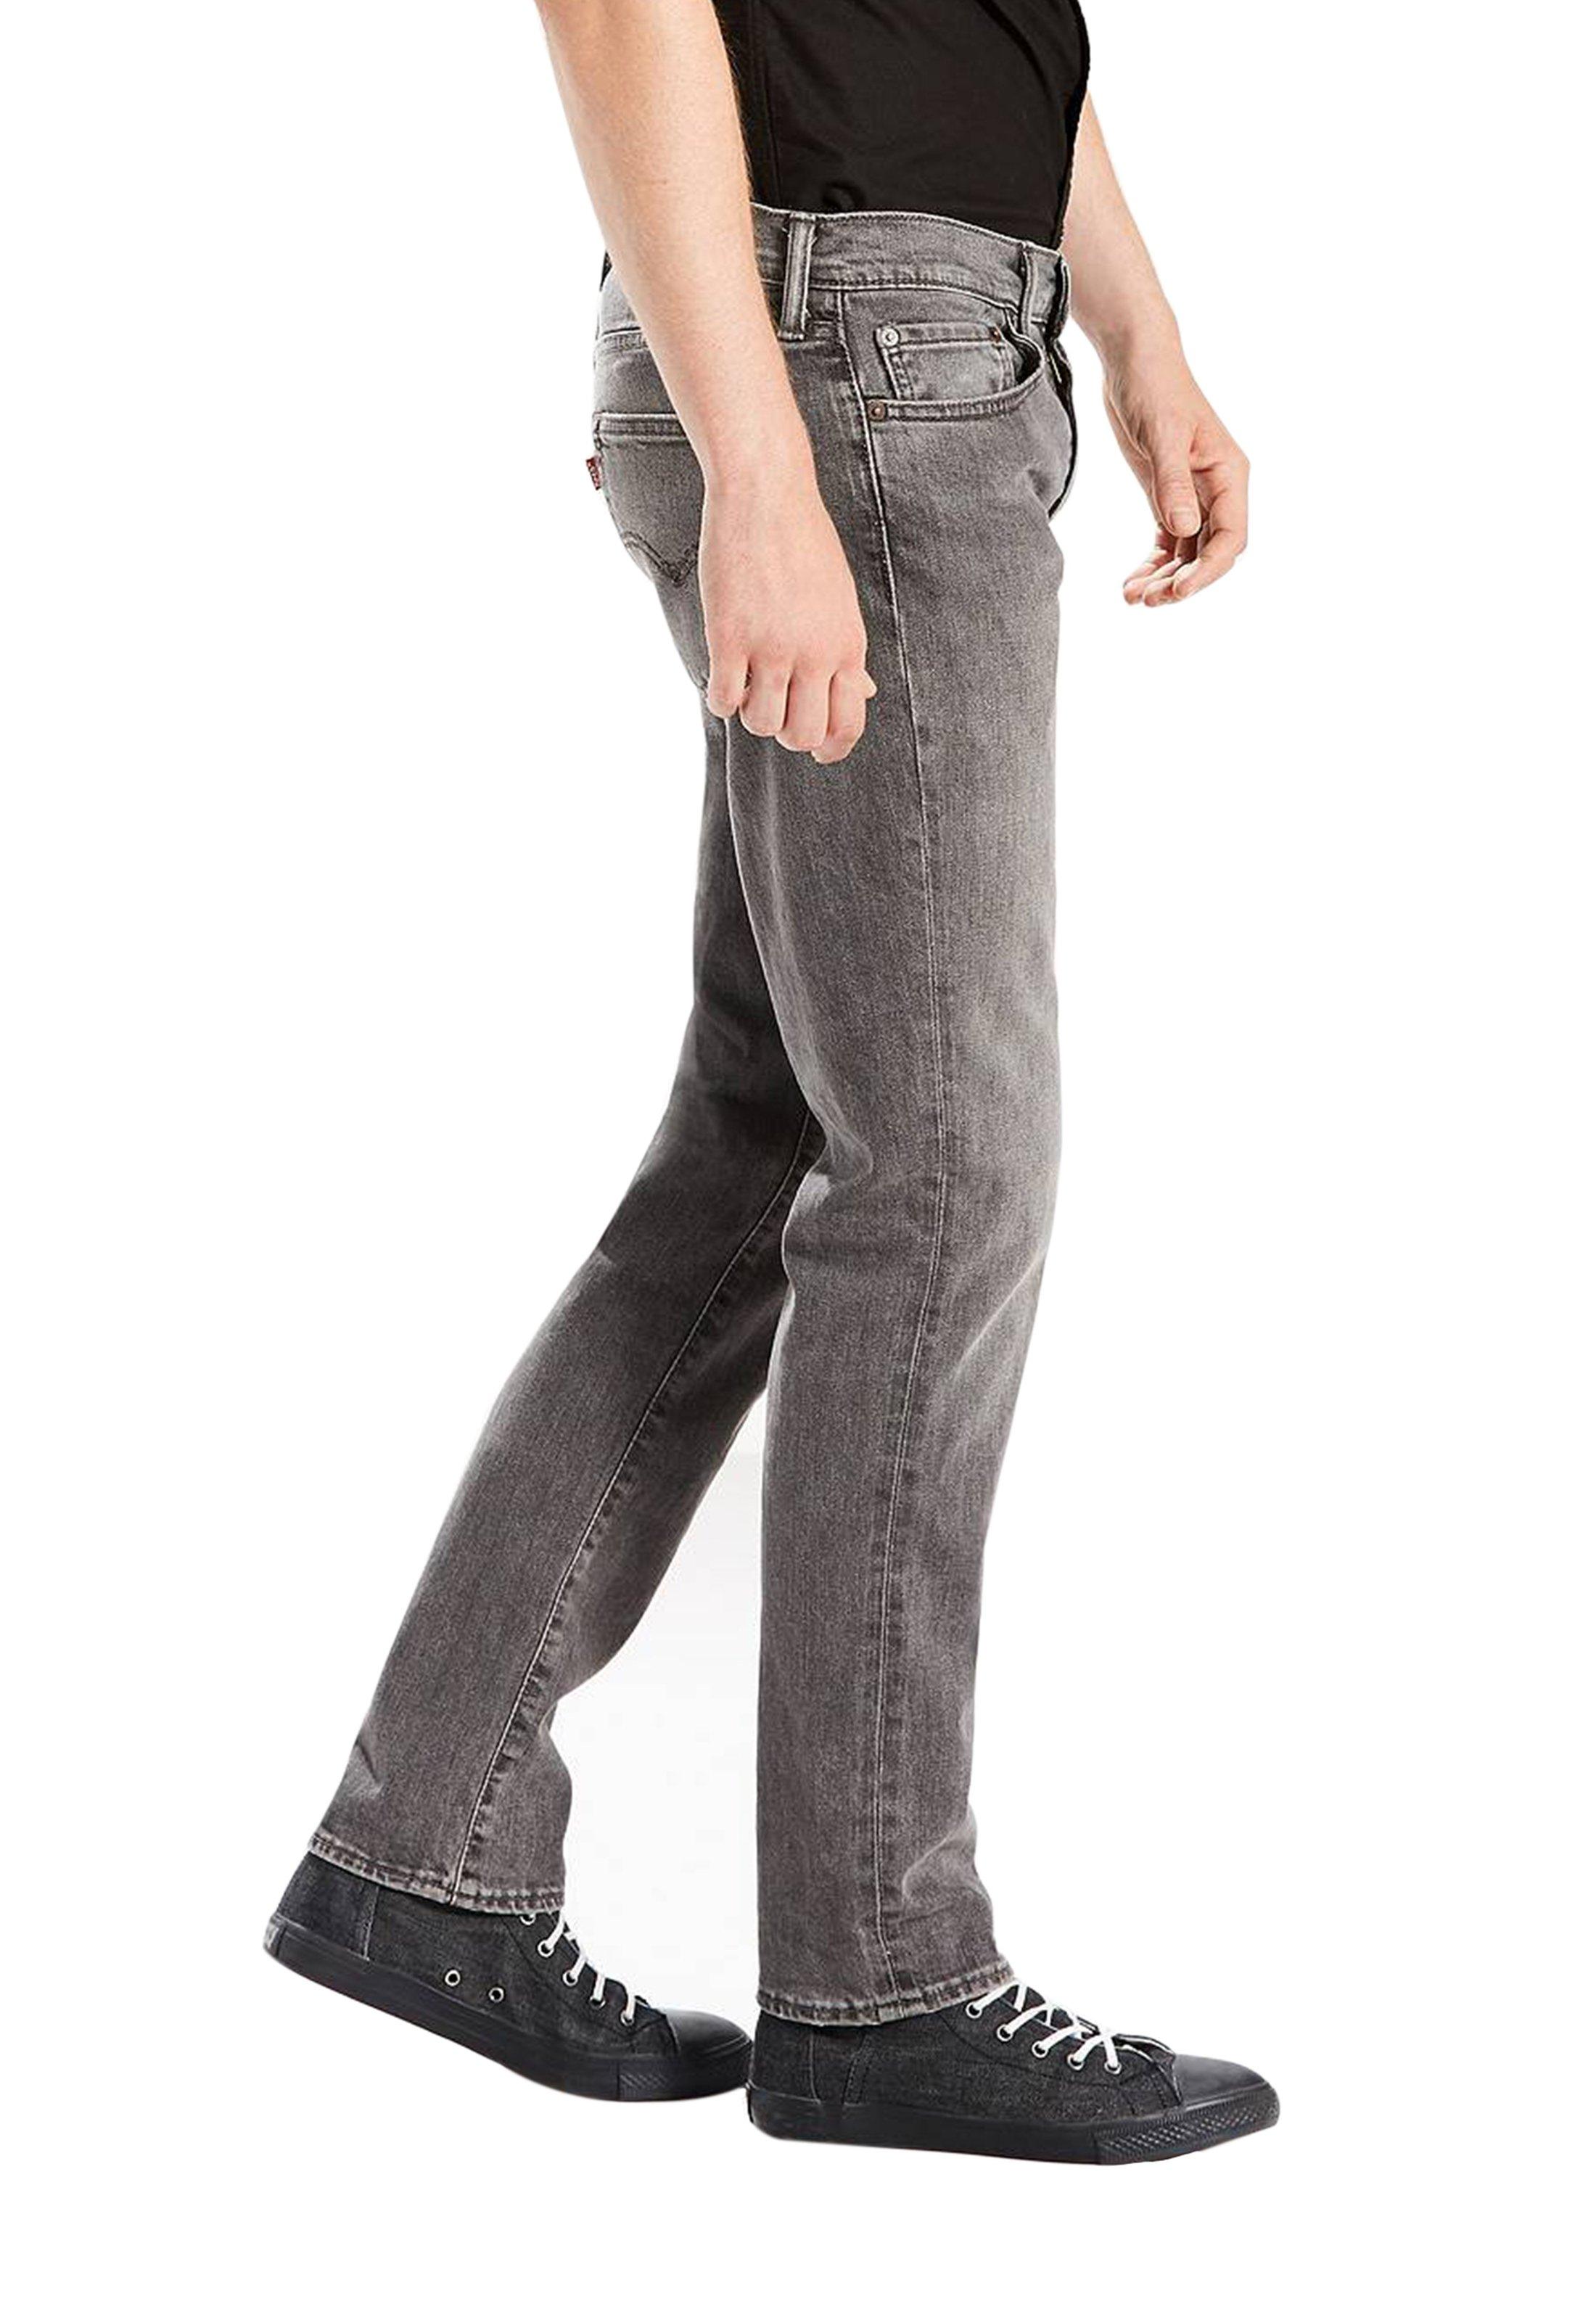 Levi's Jeans 511 Slim-Fit foto 1